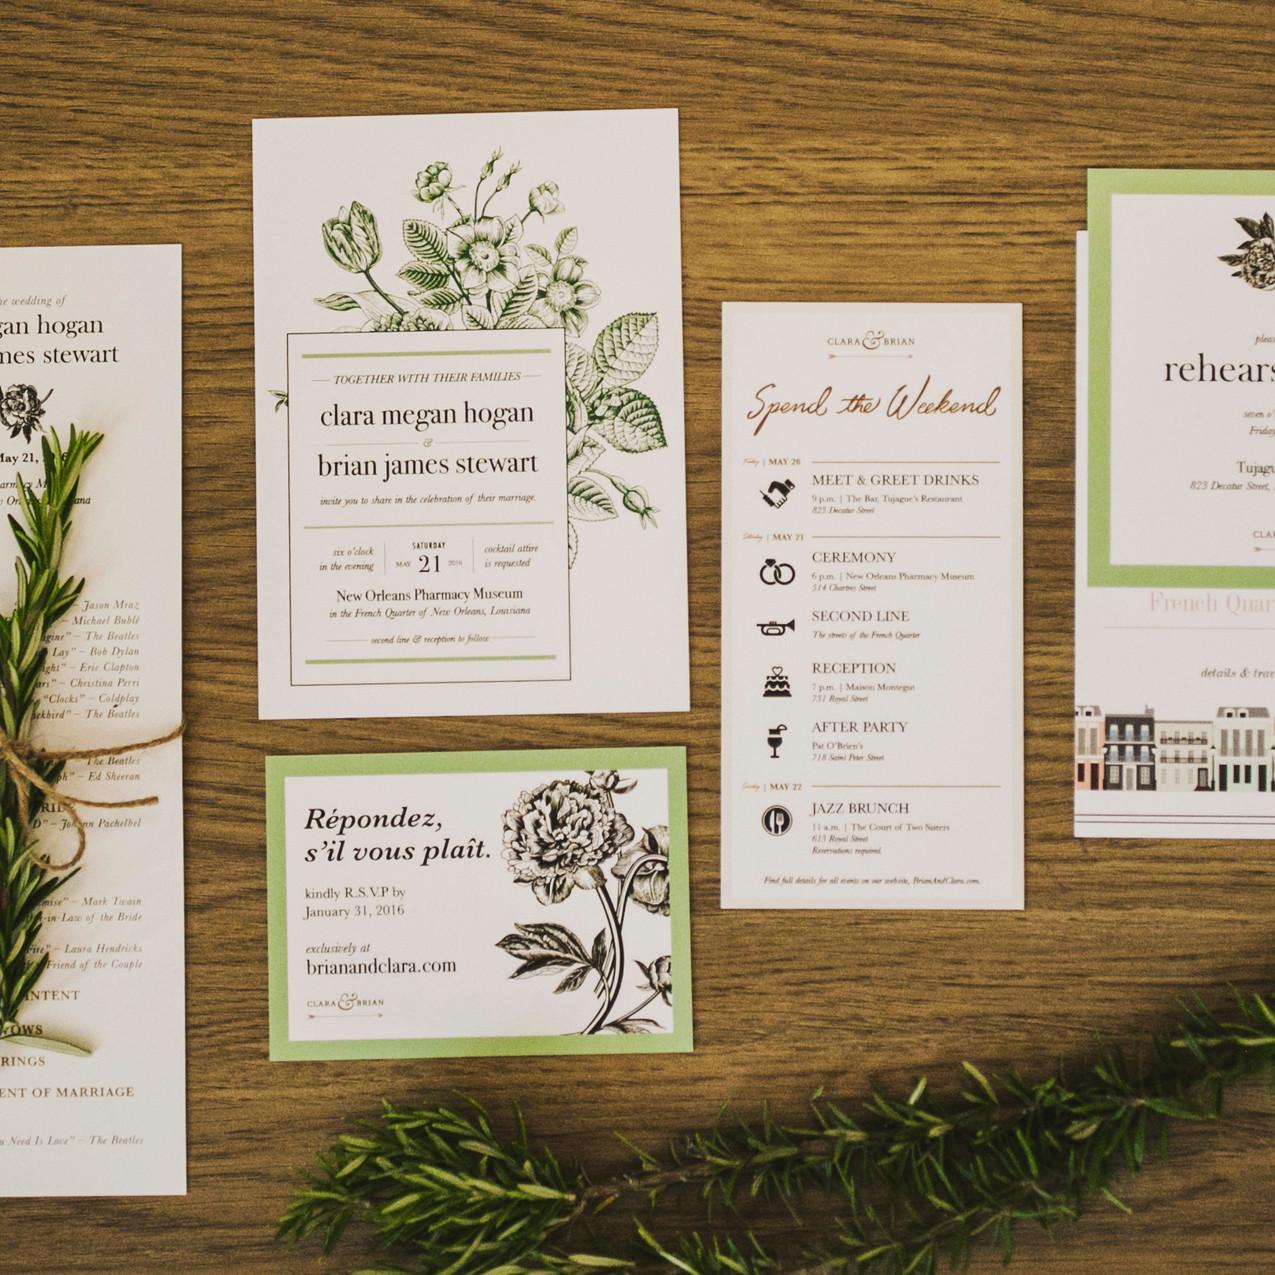 cb_wedding-details-161